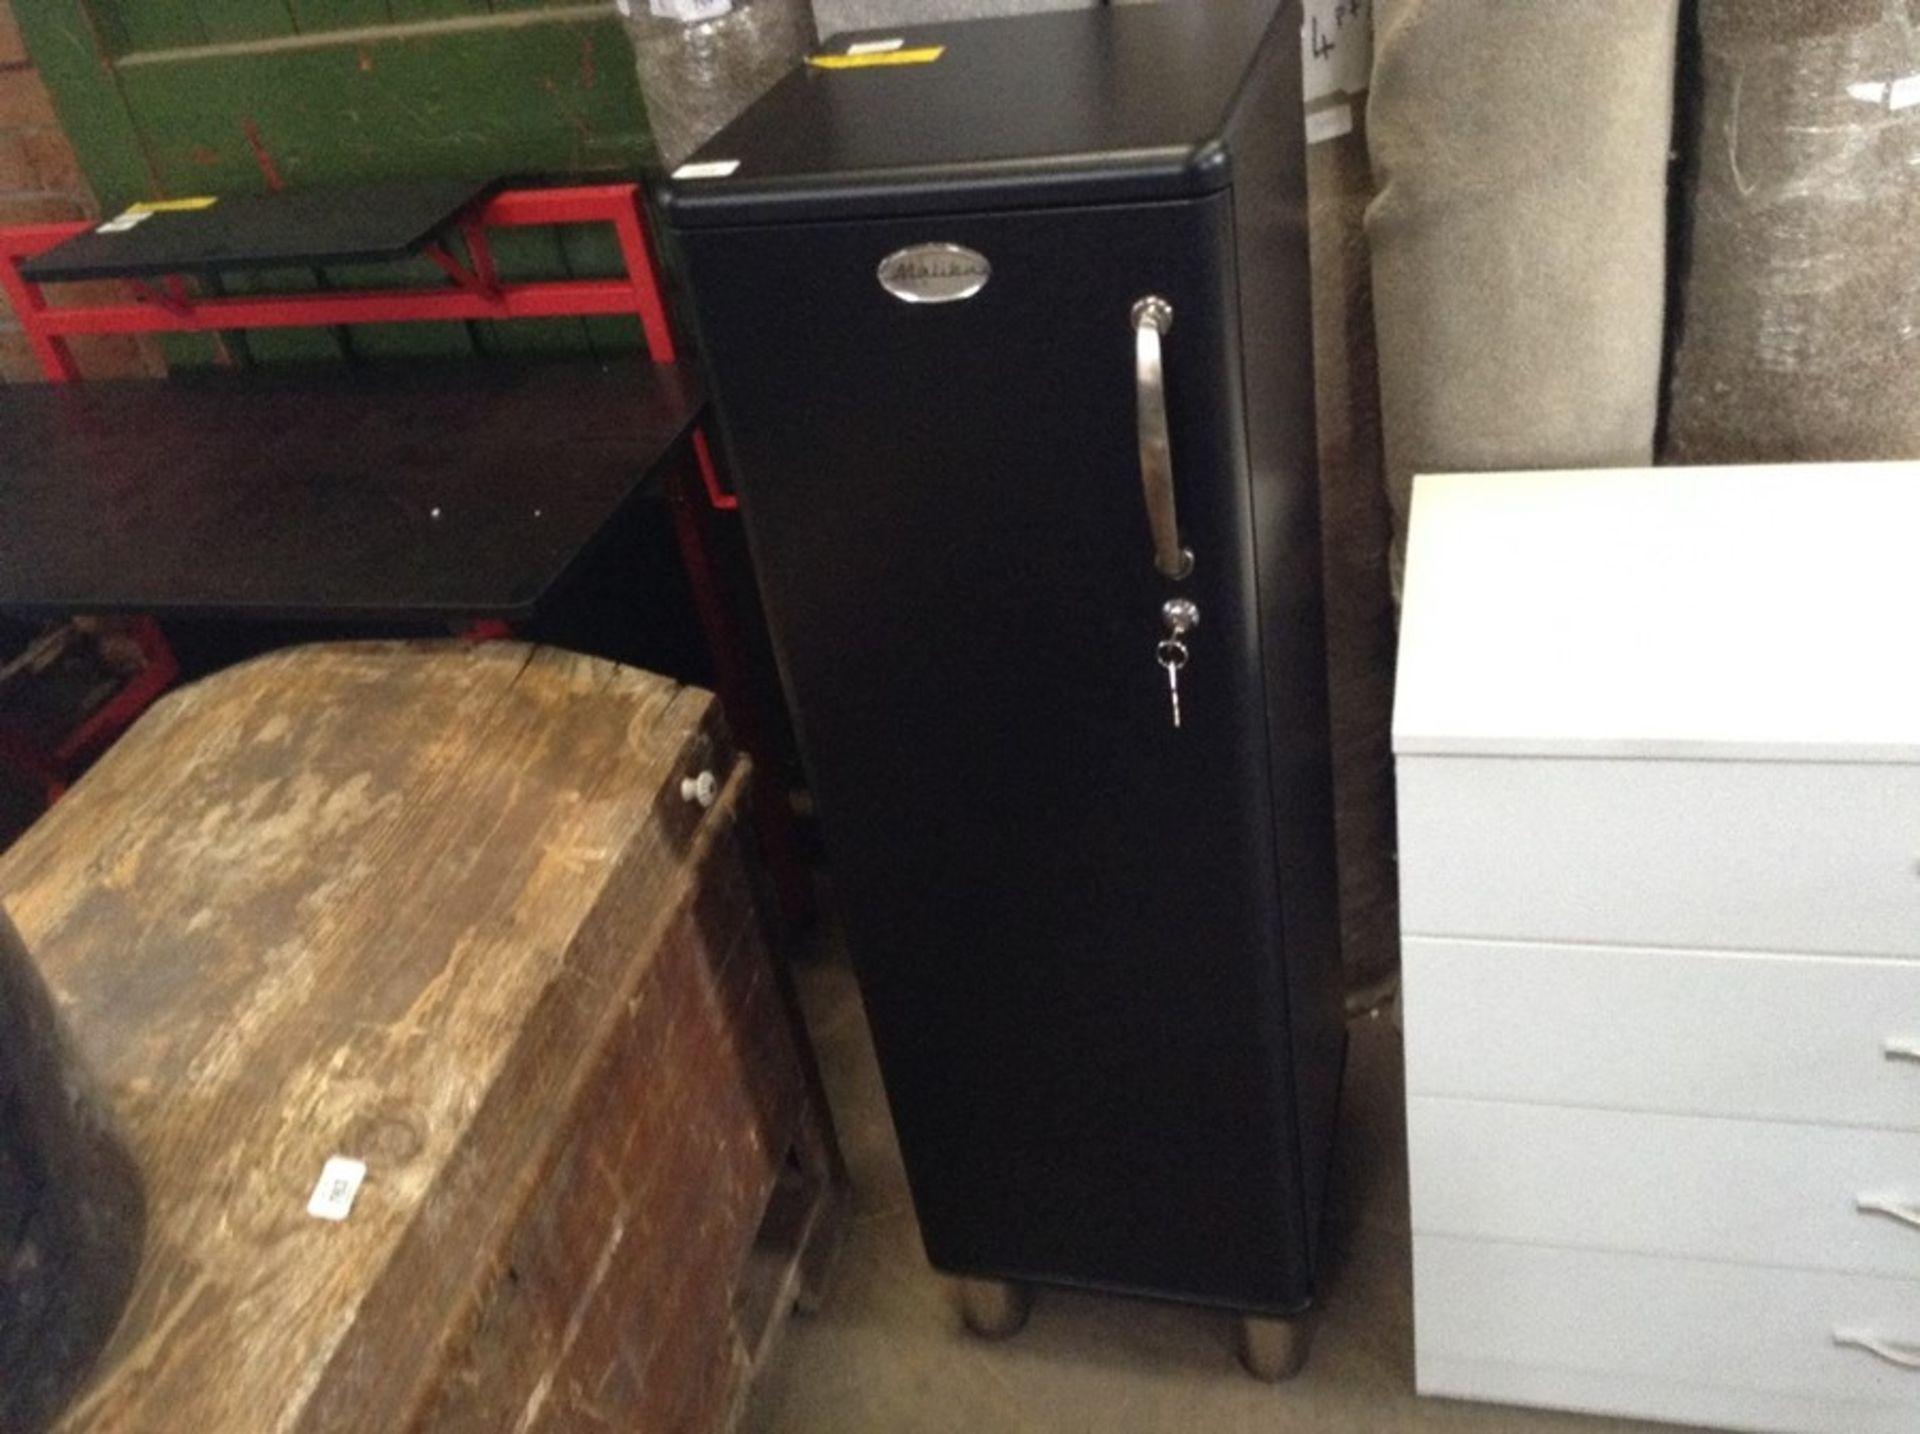 Lot 773 - Tenzo,Malibu 1 Door Storage Cabinet RRP - £182.99 (H16053 - 3/38 -WLDH1172.12887360)